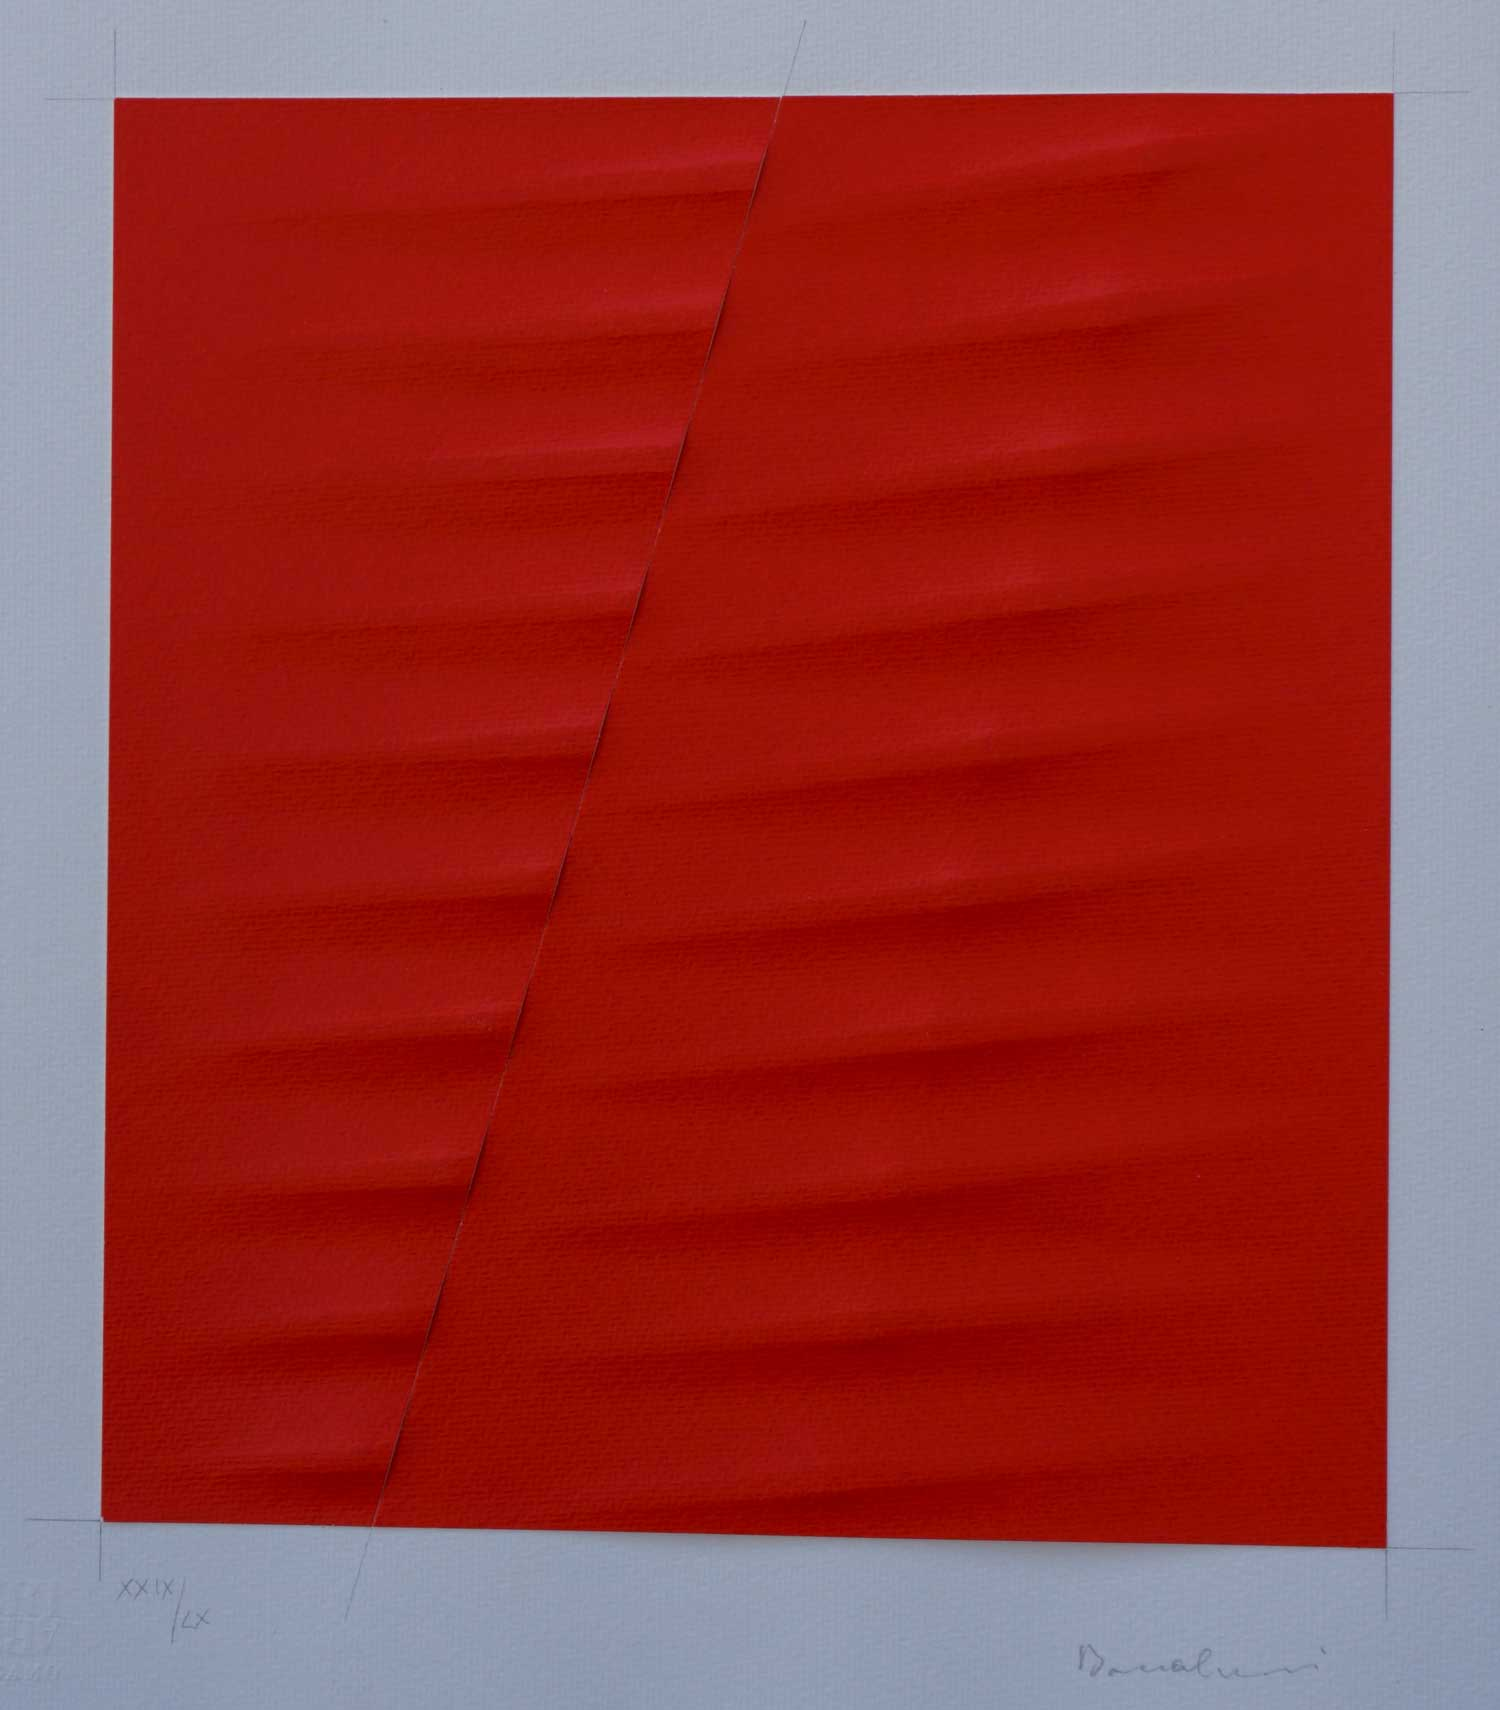 Bonalumi Agostino - Rosso